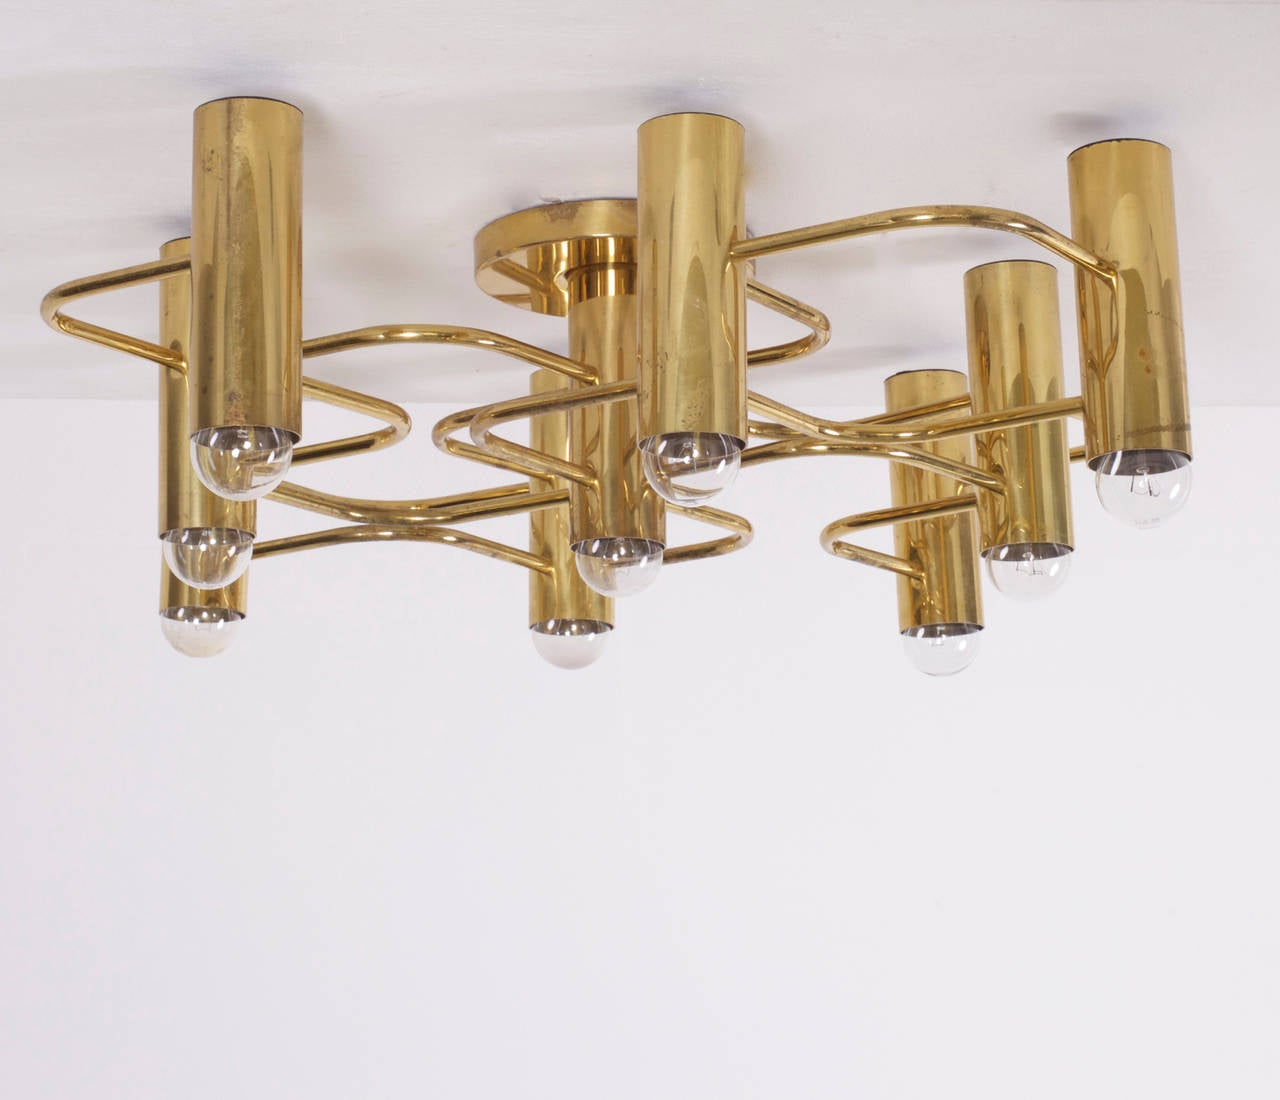 Brass Nine-Light Flush Mount Wall or Ceiling Lamp by Leola at 1stdibs